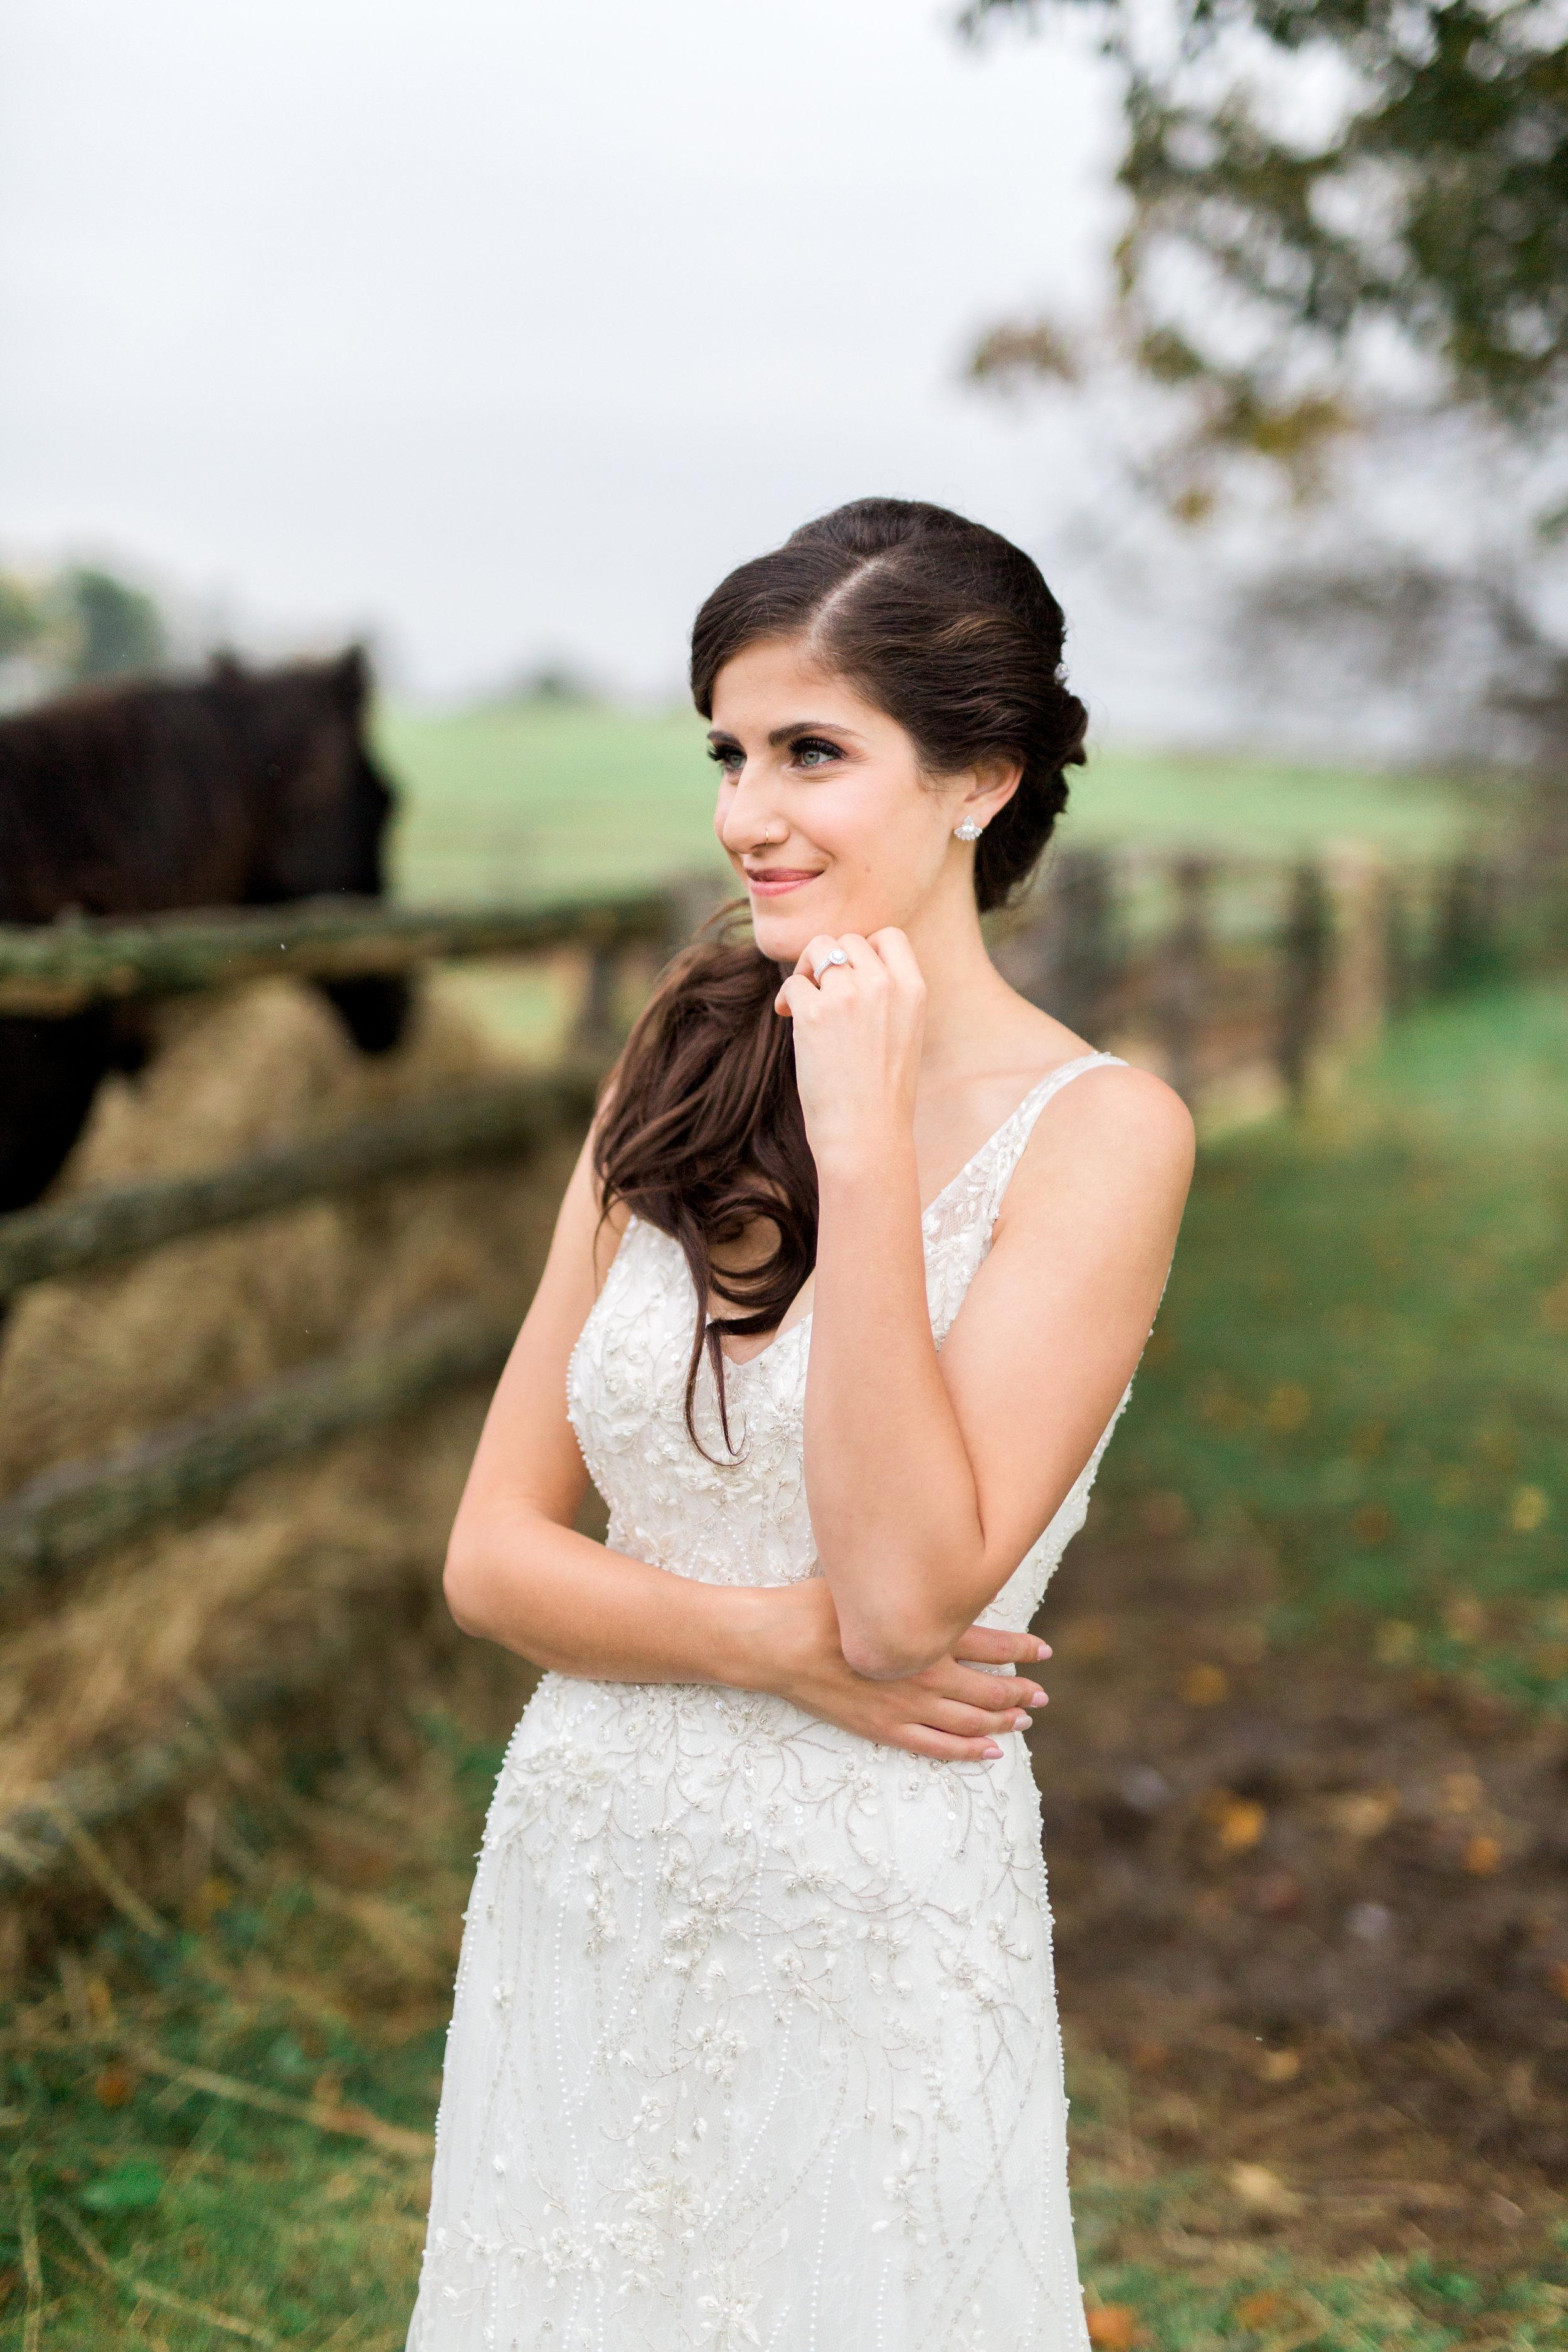 Amir-Golbazi-Danielle-Giroux-Photography_Toronto-Wedding_Cedarwood_Rachel-Paul_523.jpg